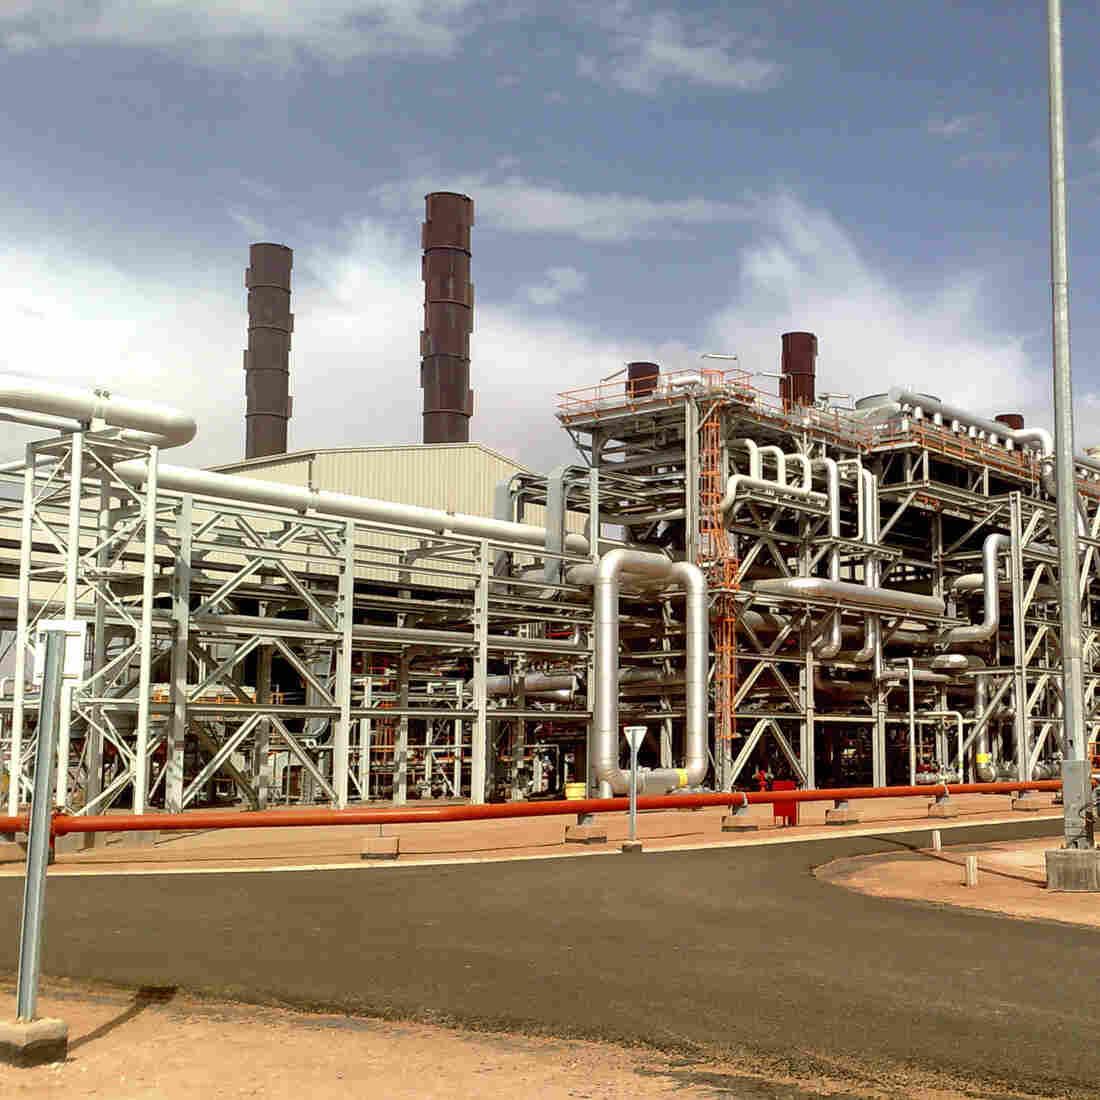 Algeria Attack A 'Wake-Up Call' For Energy Companies